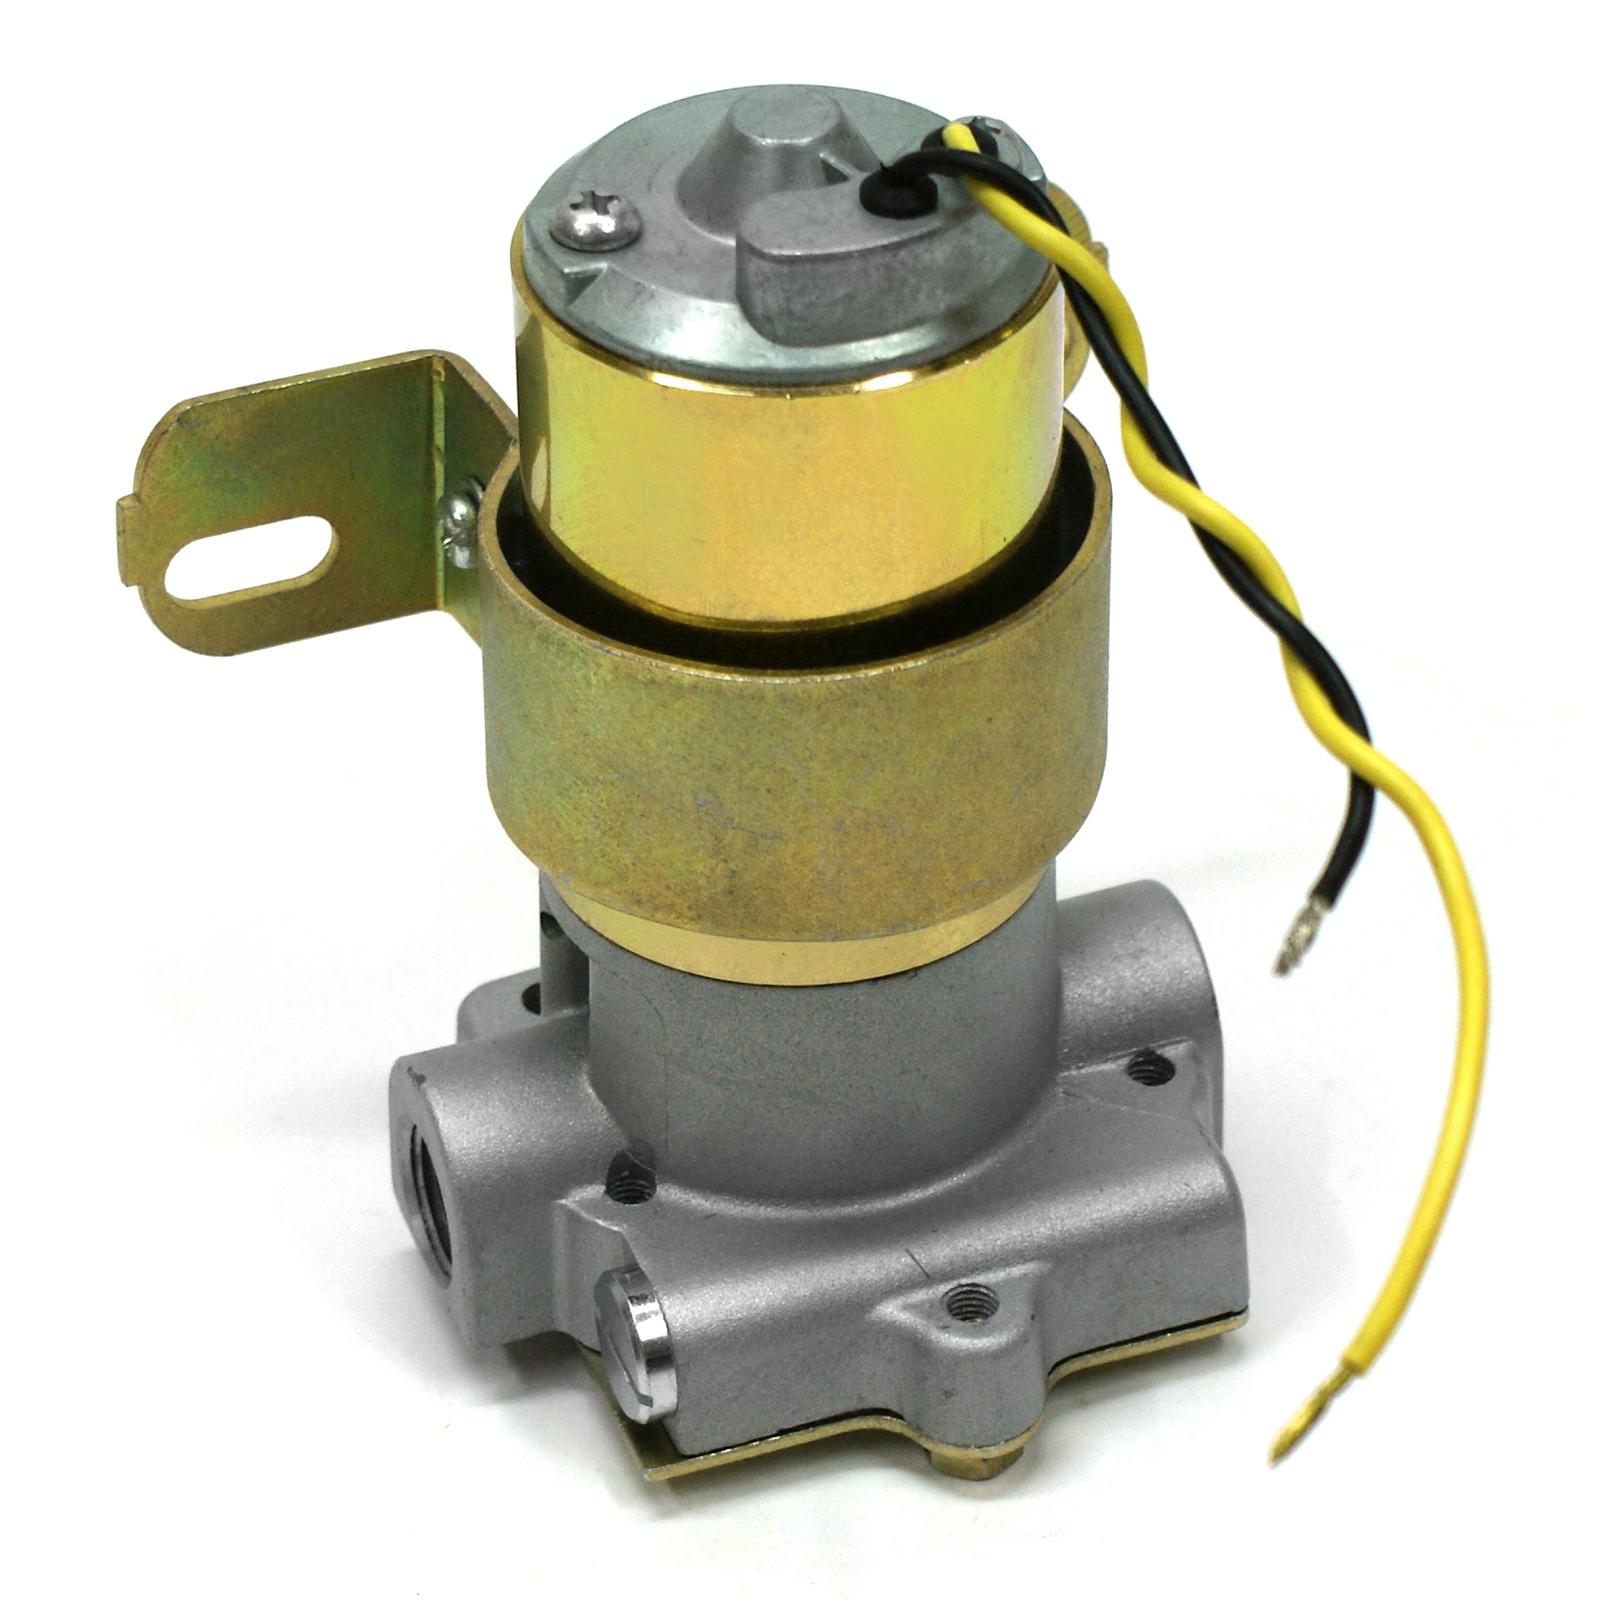 110 Gph @ 14 PSI Universal Electric Fuel Pump